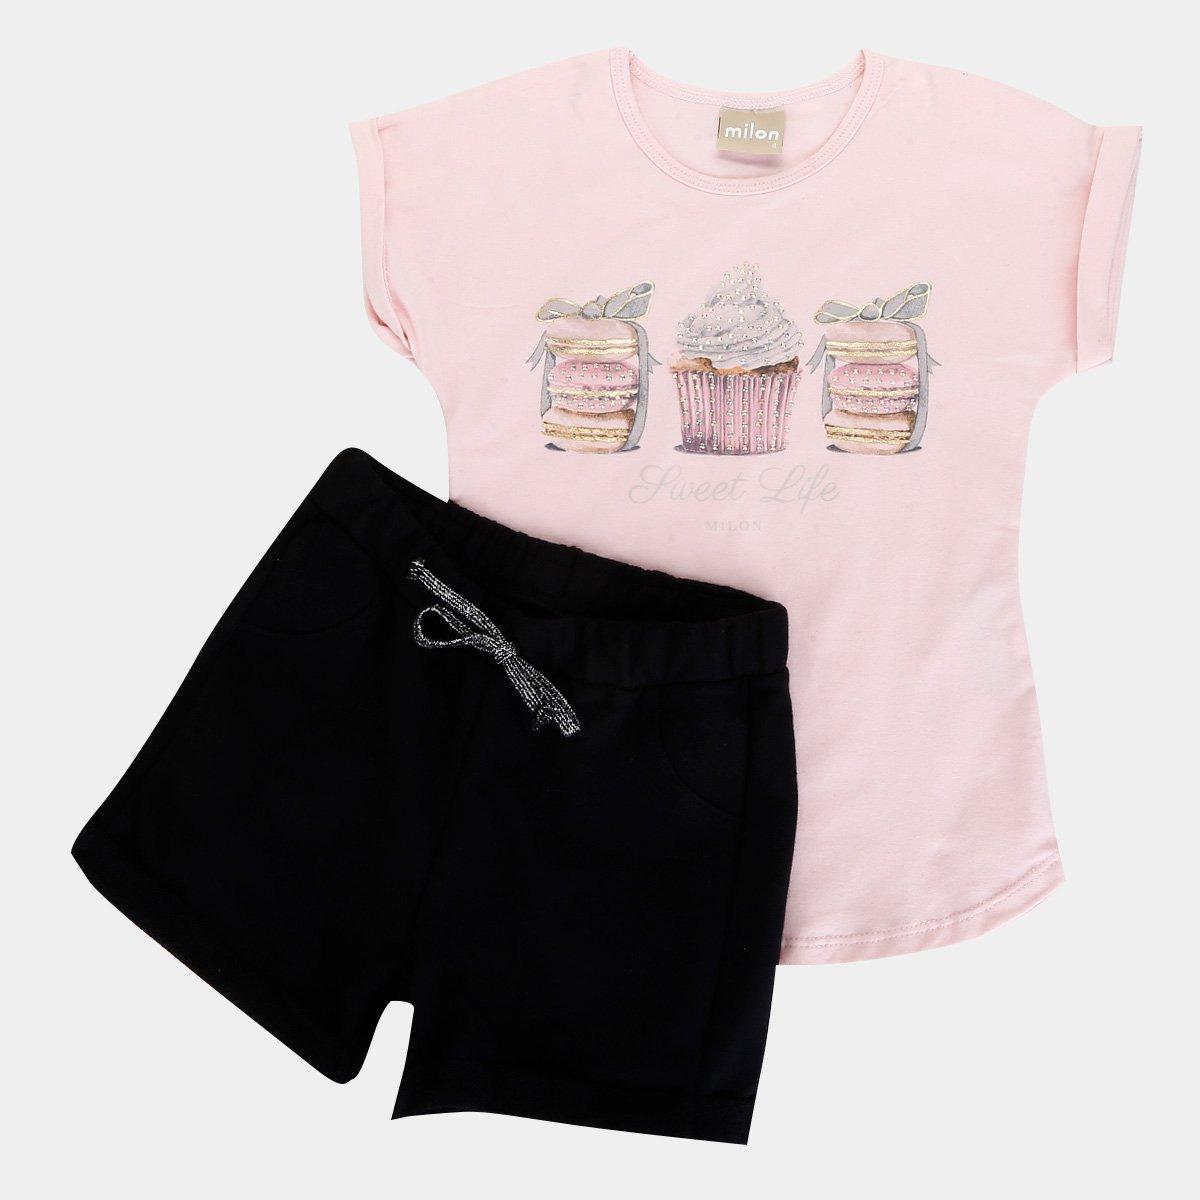 Conjunto Infantil Milon Blusa Cottonshort Moletom Feminino Rosa E Preto